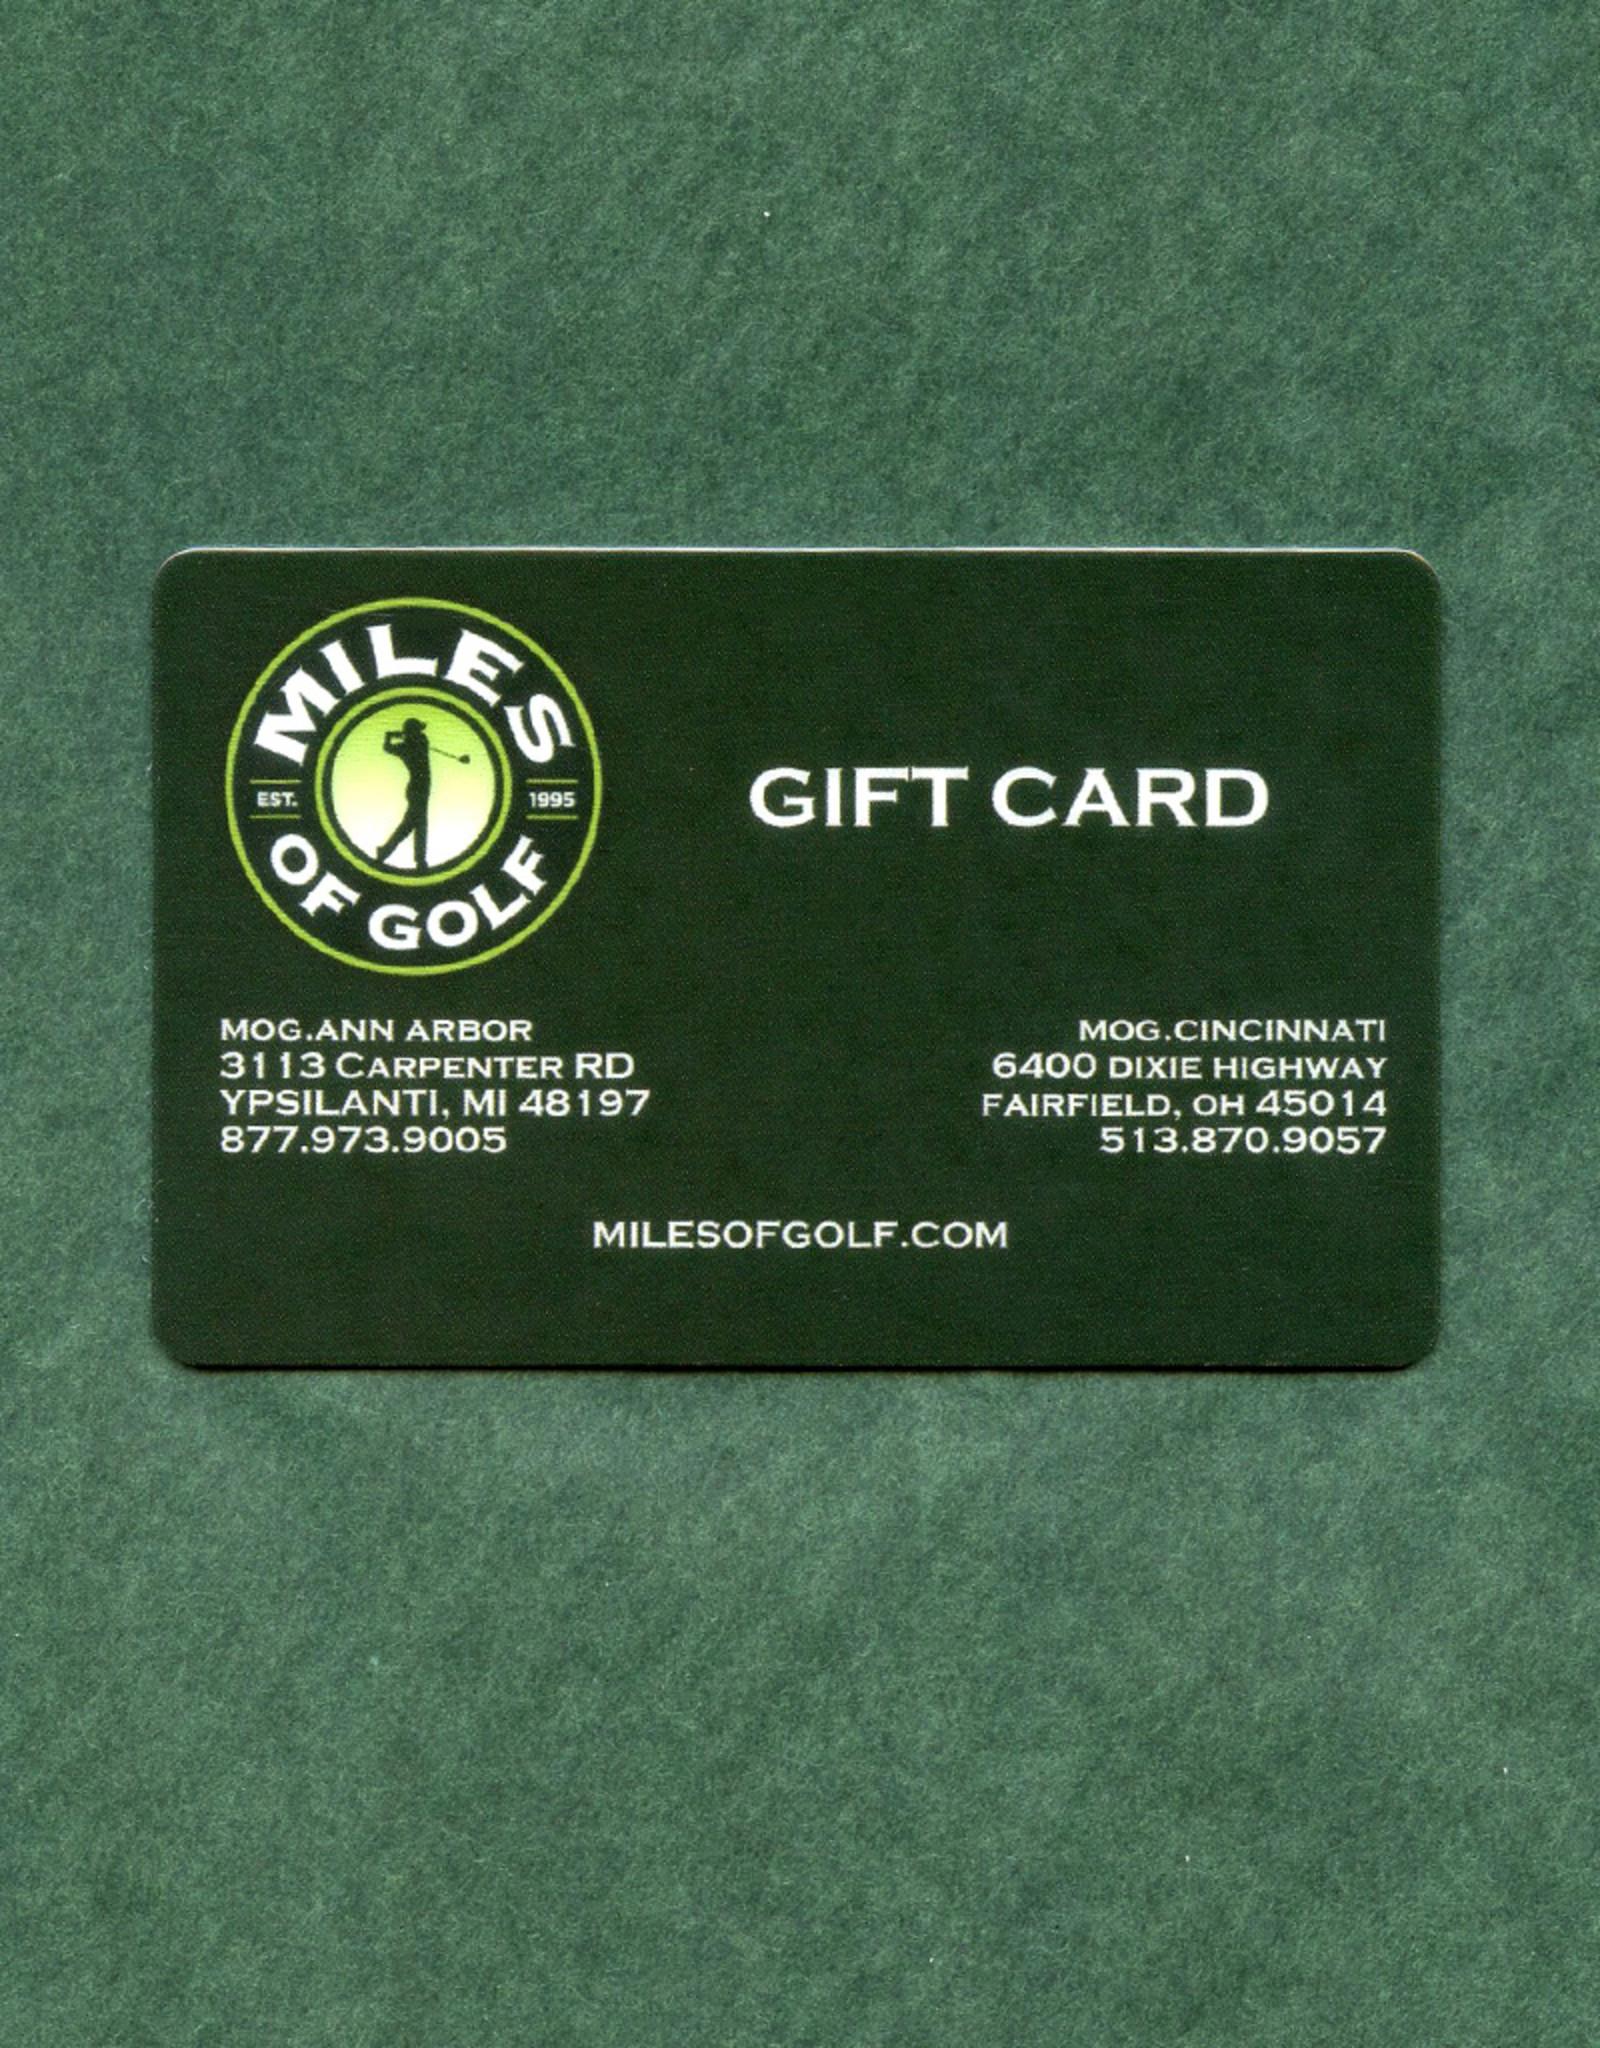 $10,000 GIFT CARD